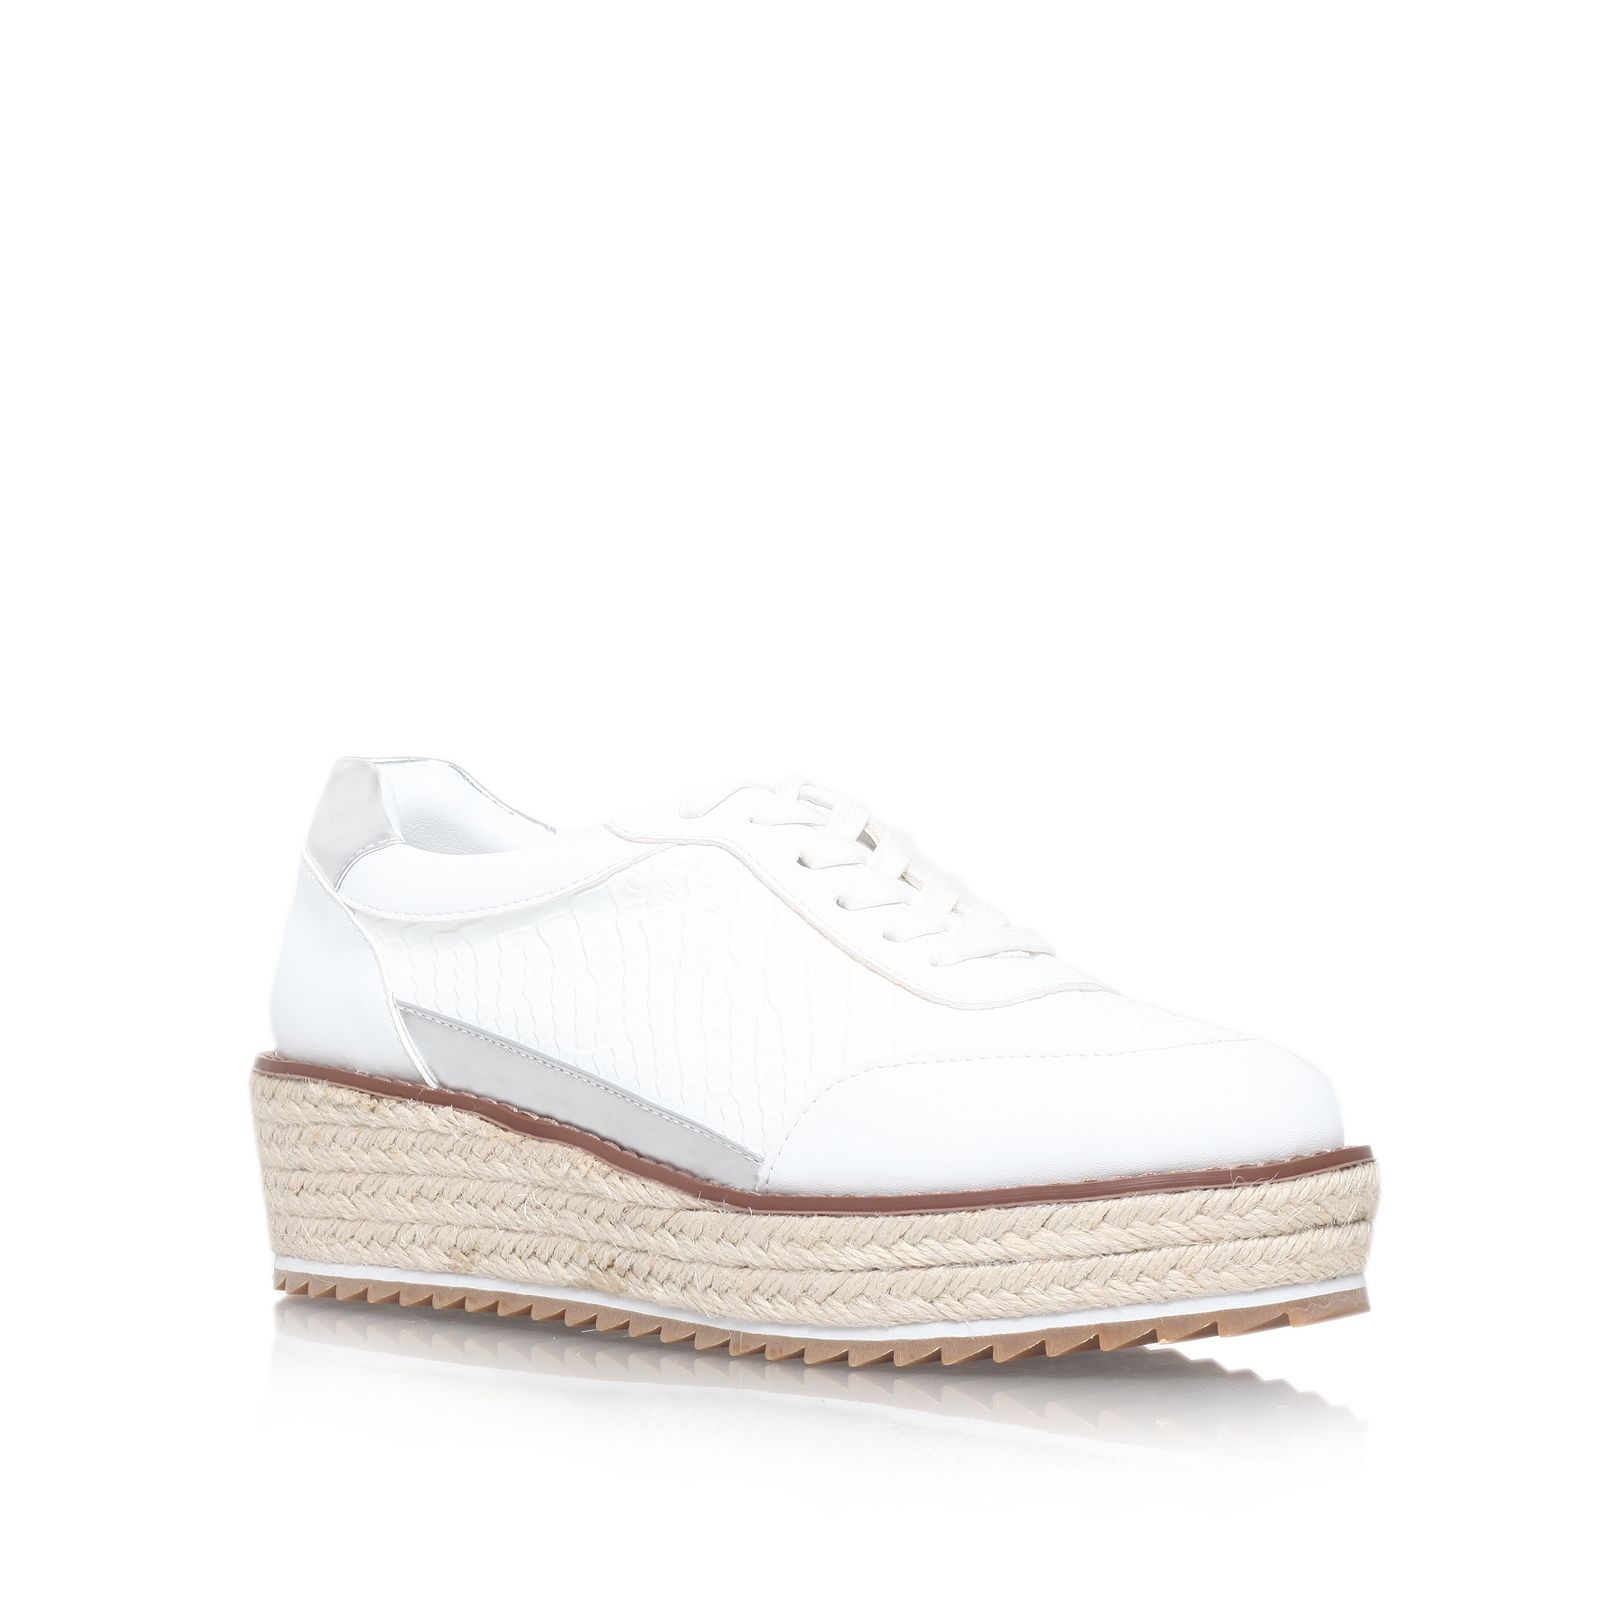 kg by kurt geiger lush flat platform lace up shoes in